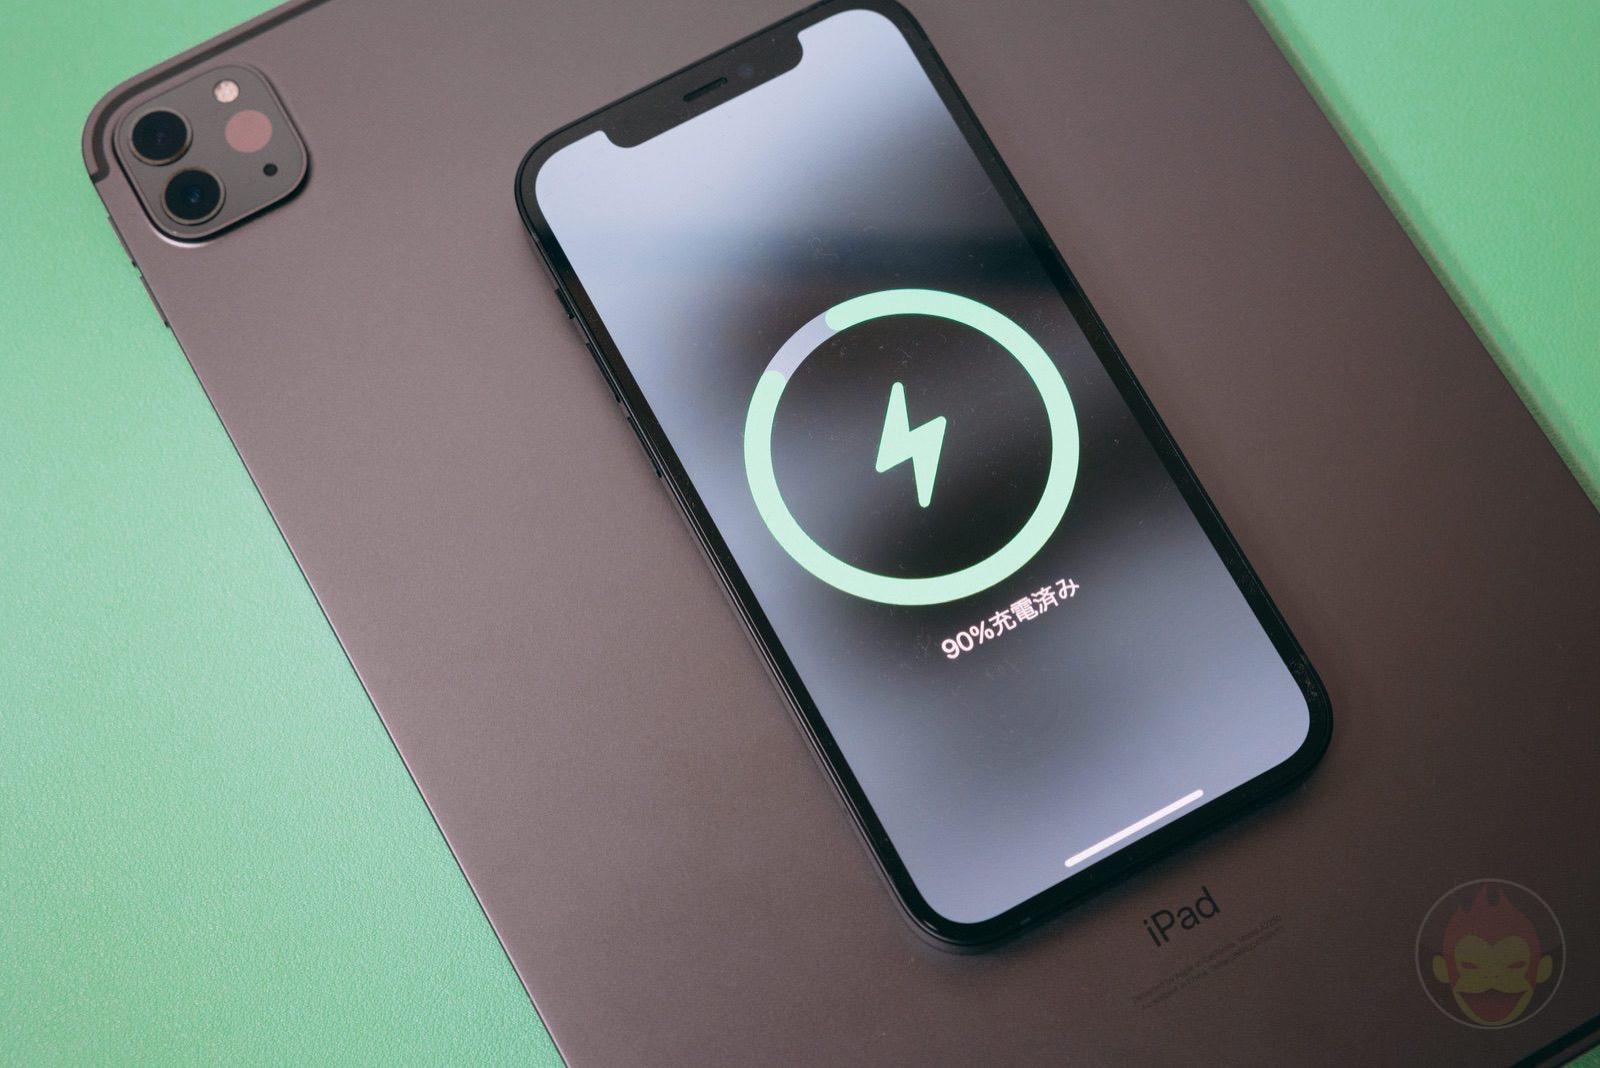 ipad-pro-and-wireless-charging-02.jpg